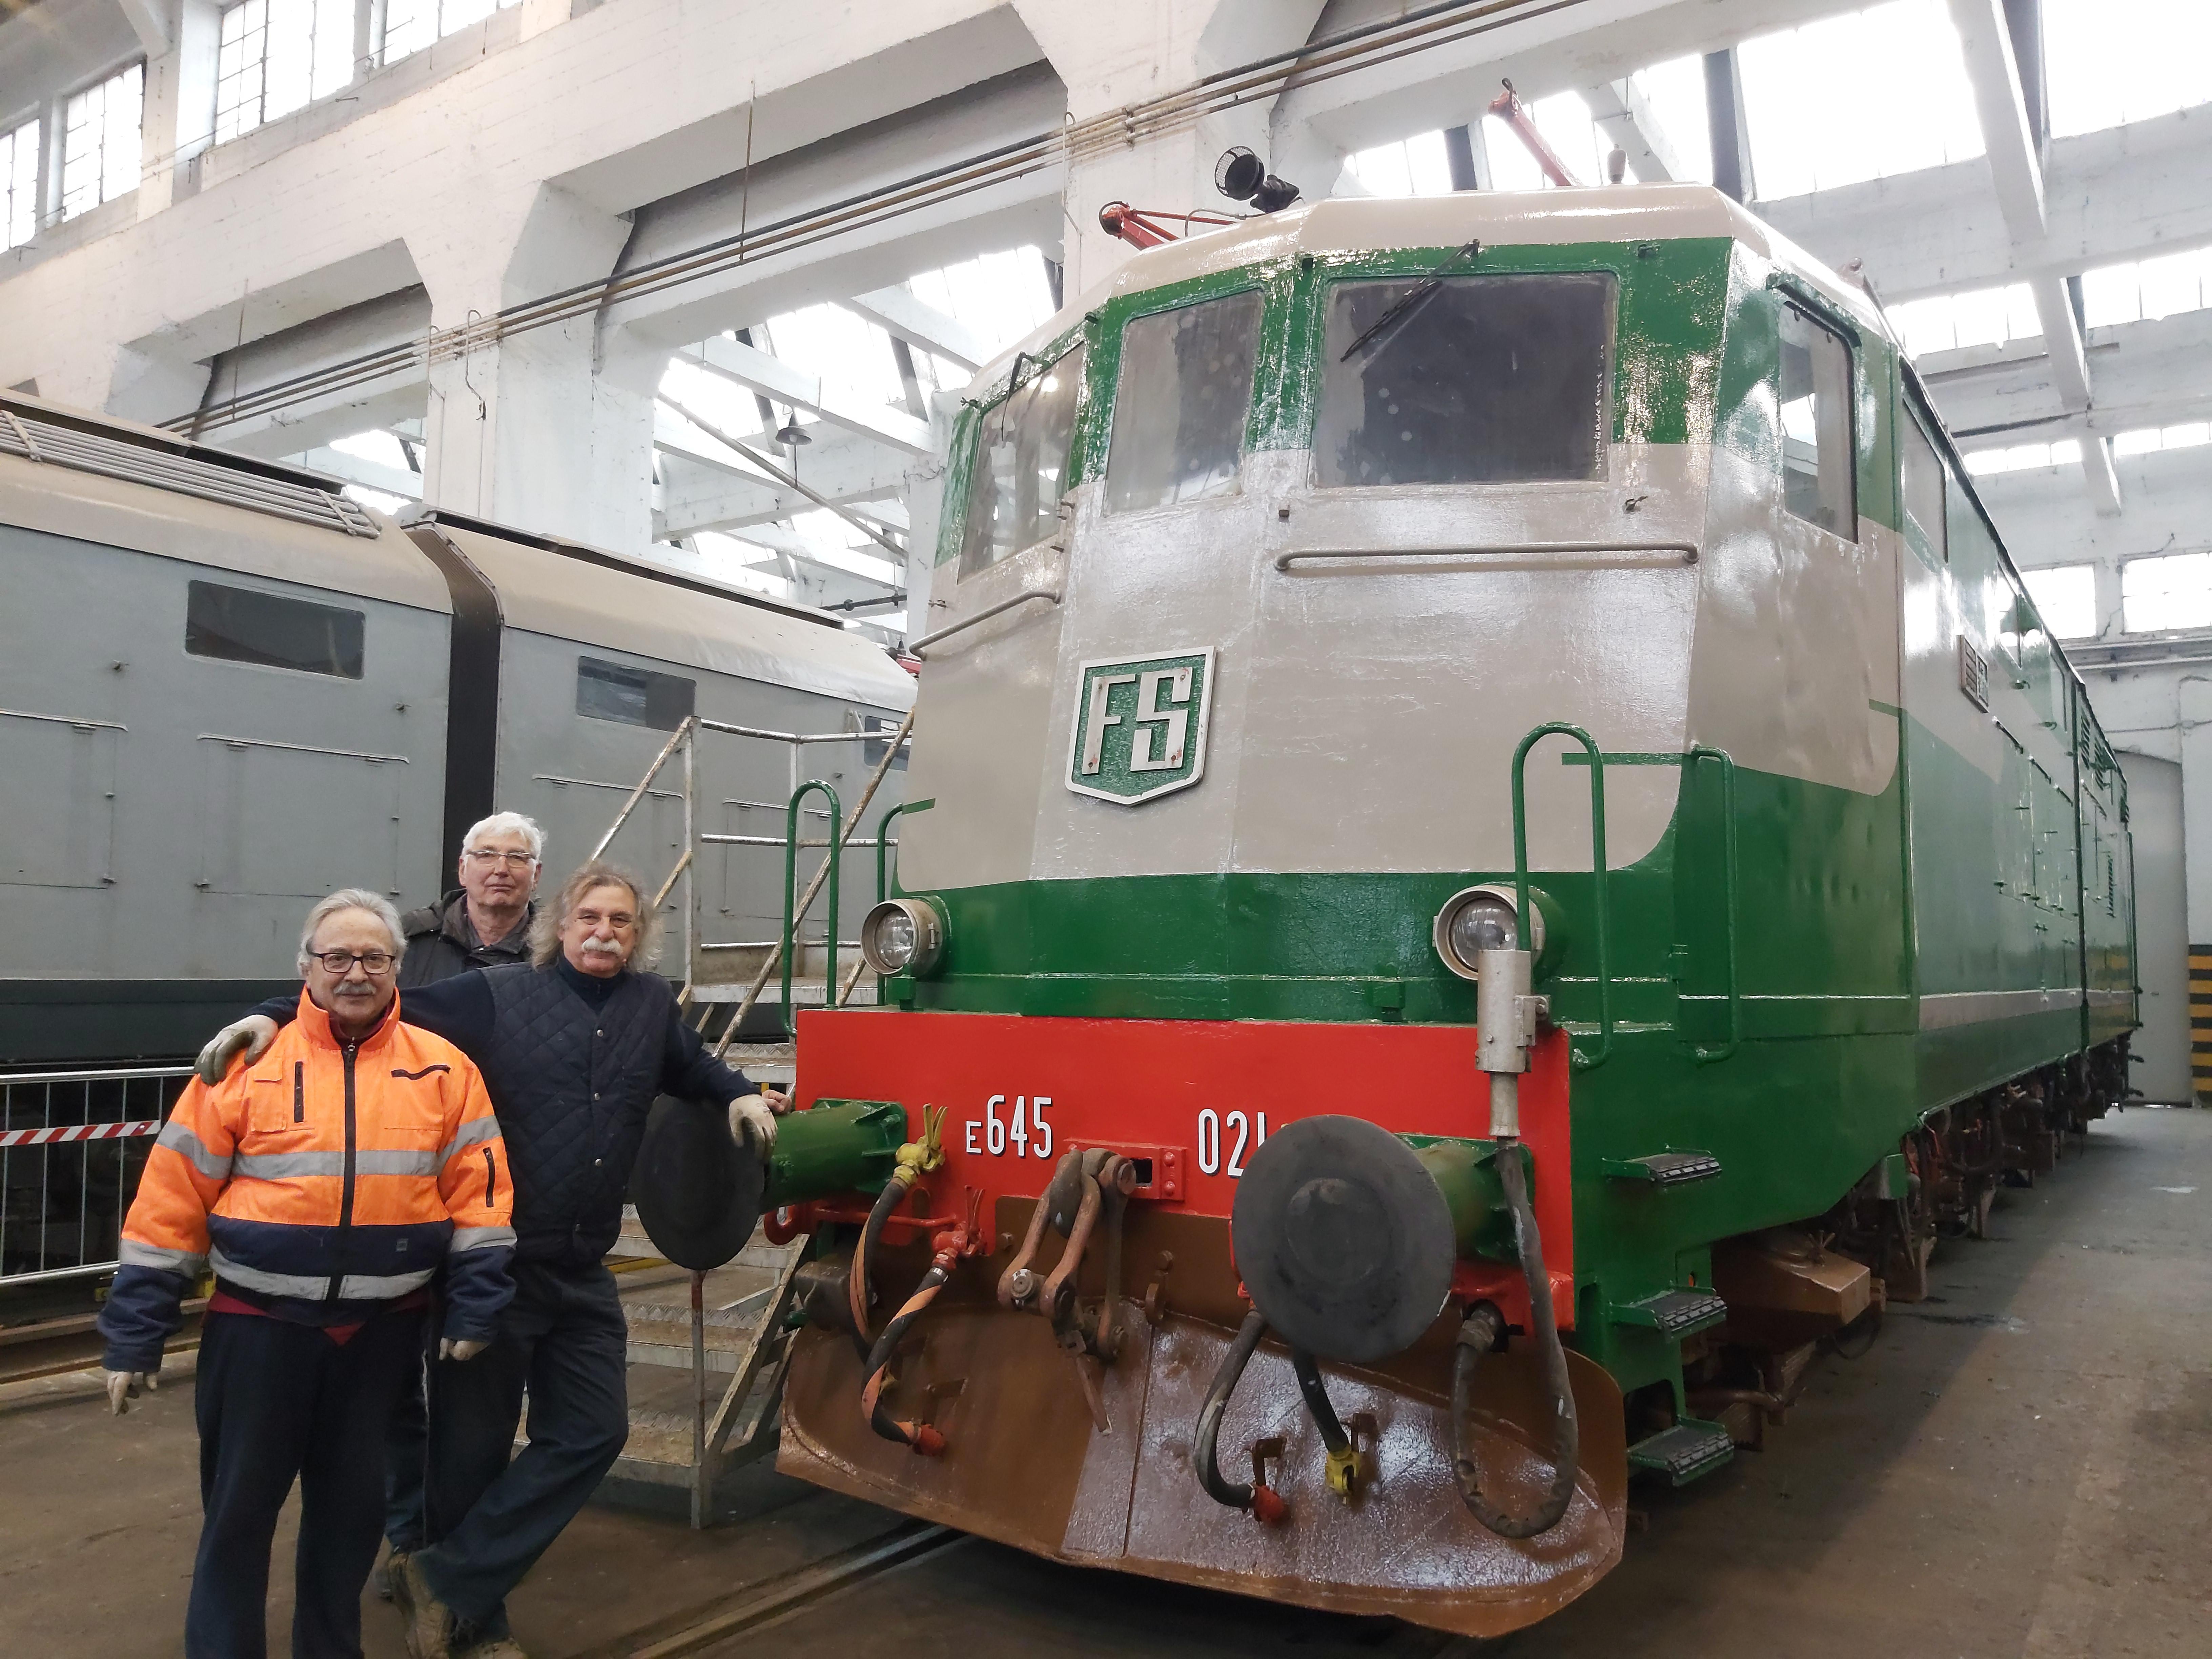 Ex ferrovieri all'opera in officina!